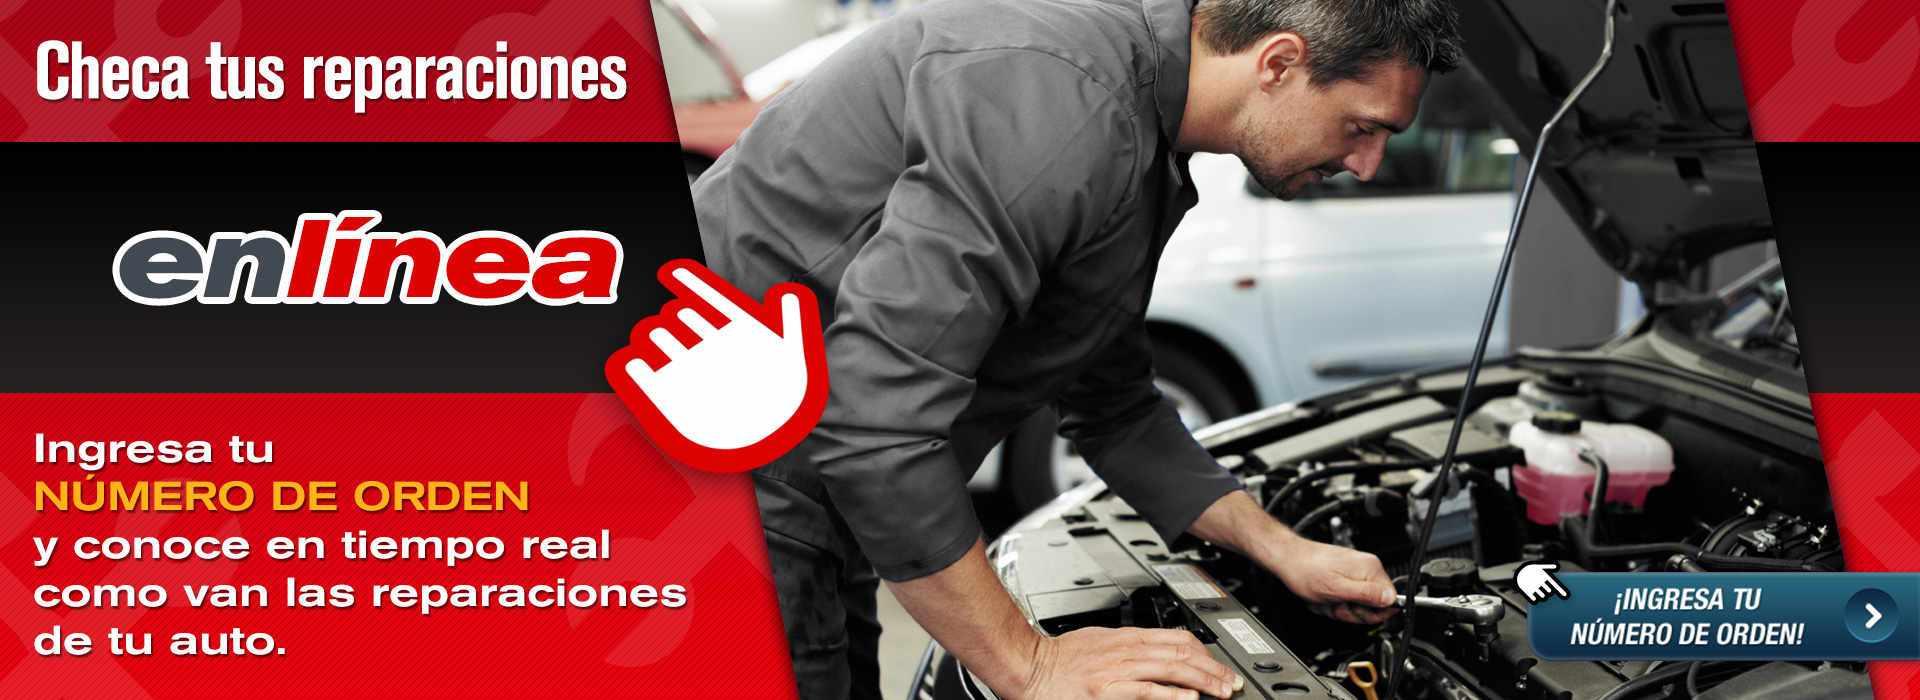 clear Mechanic - Consulta tu orden de servicio